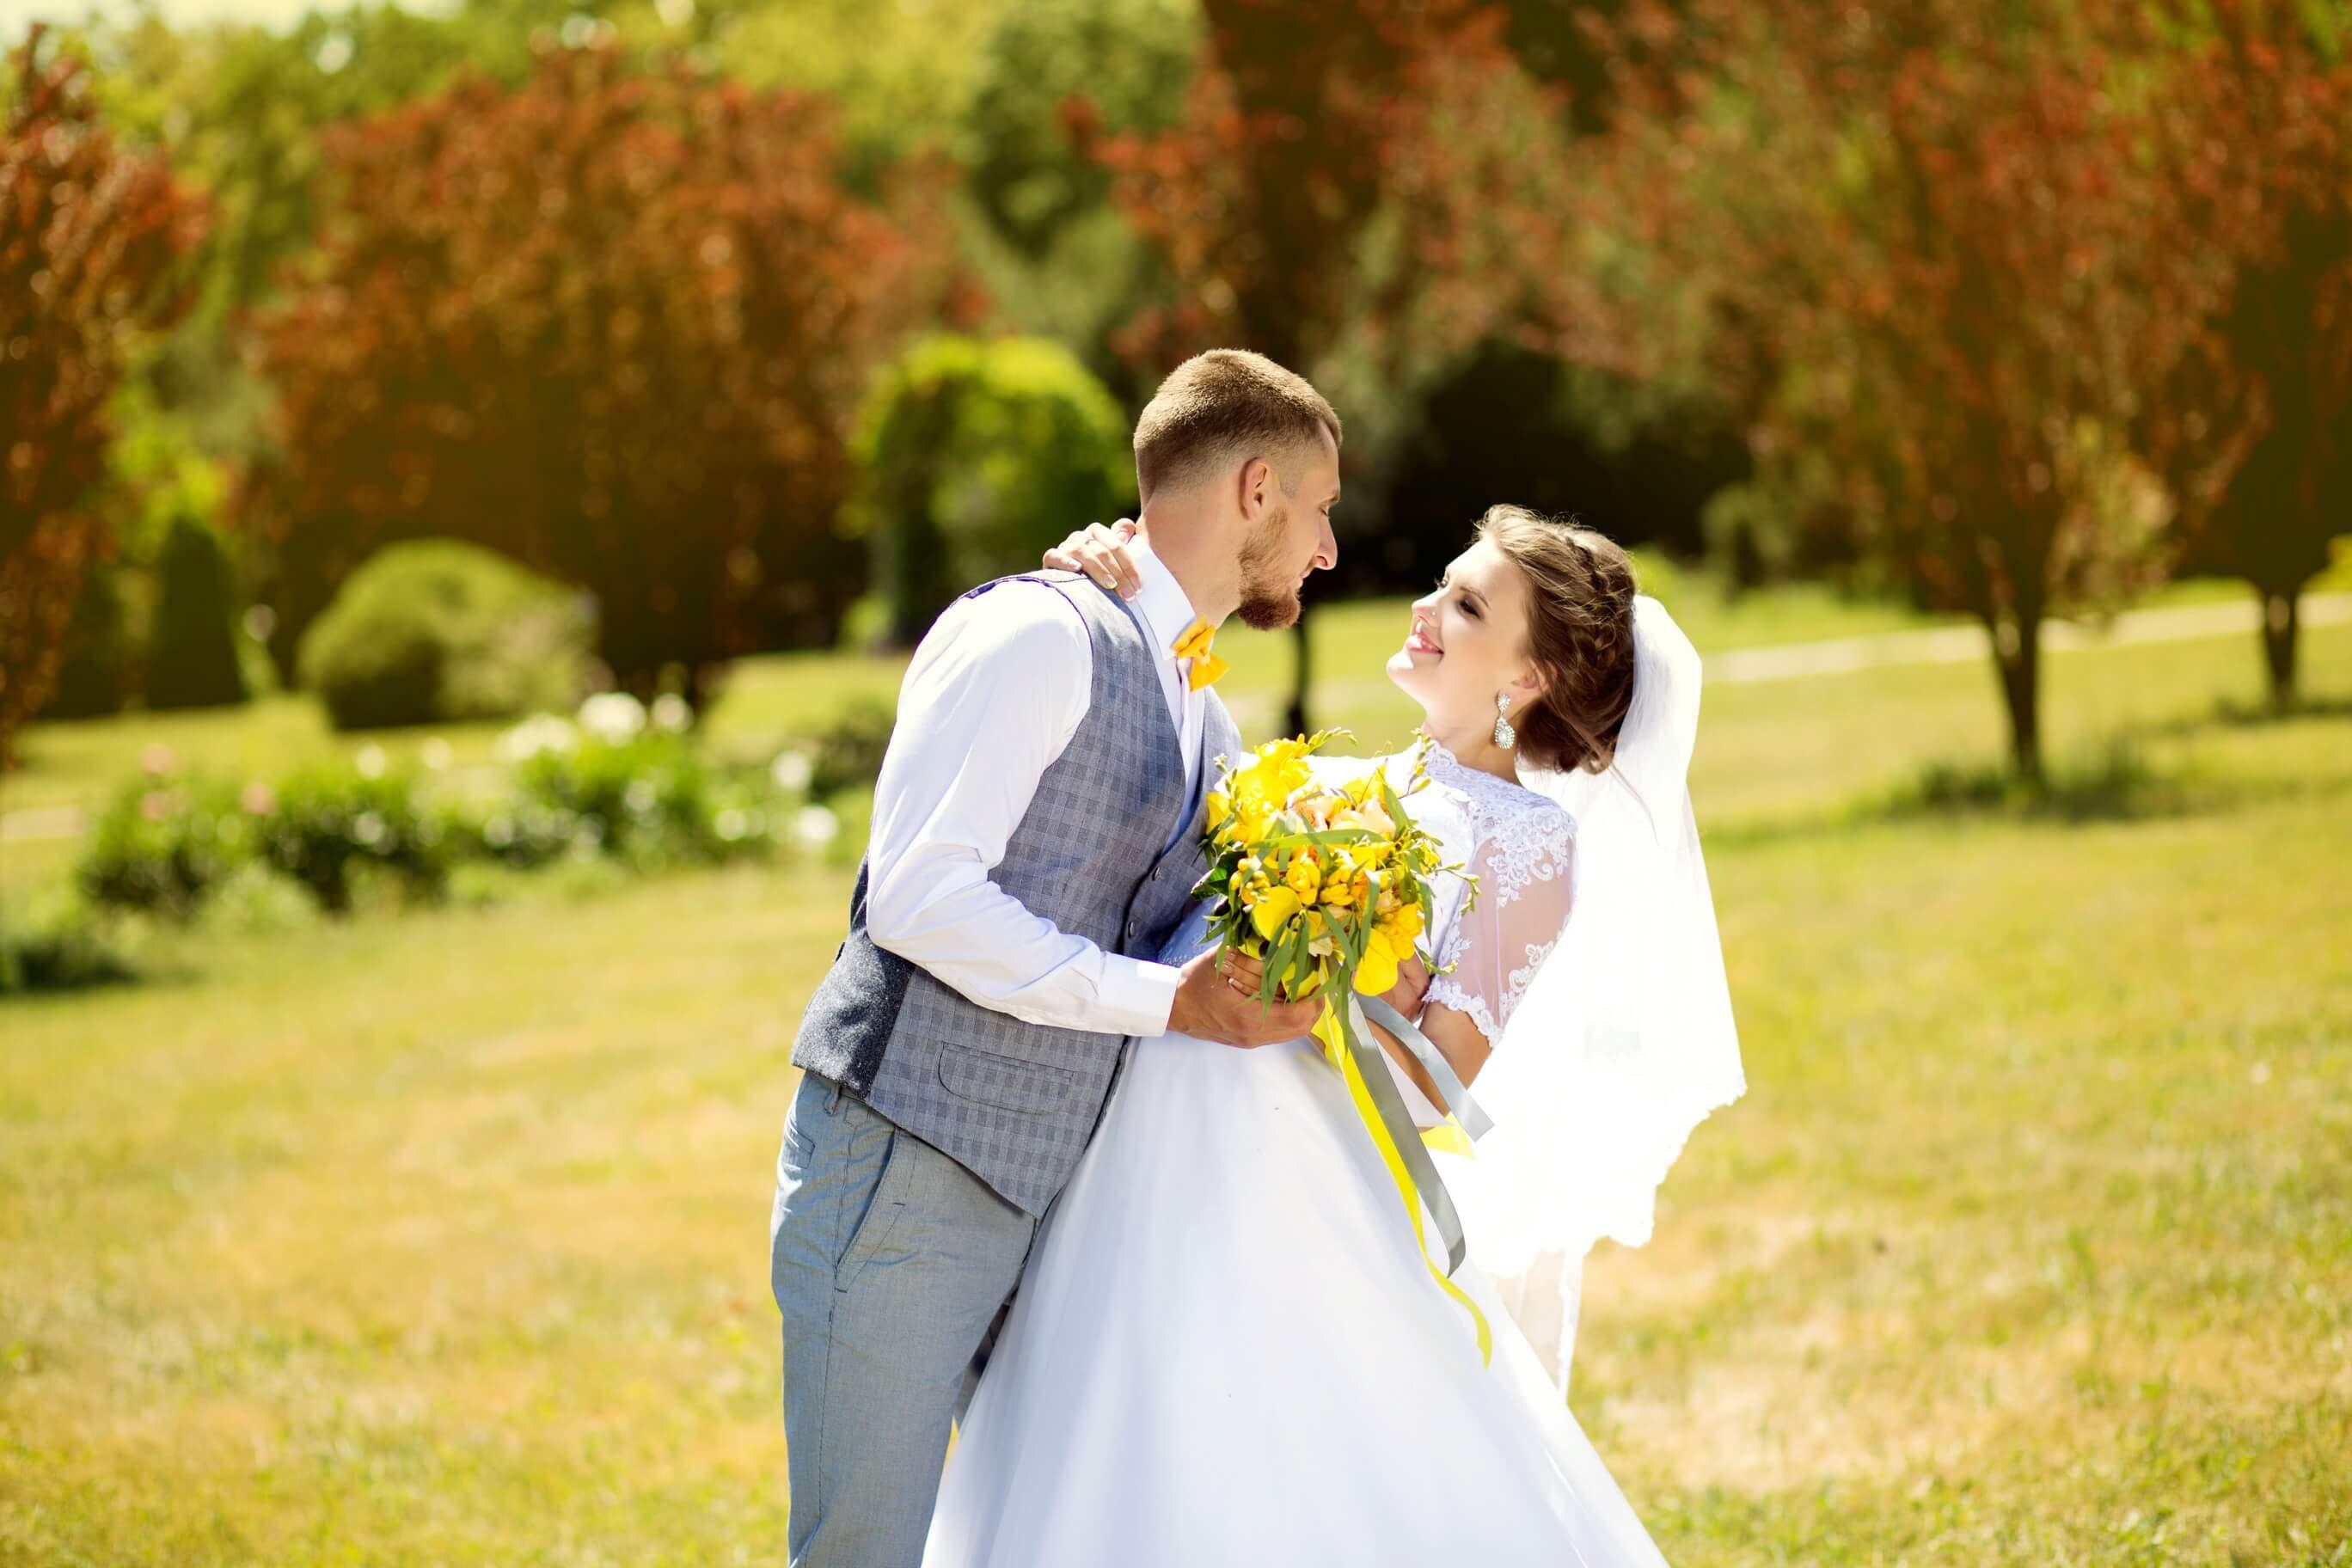 sajt fotograf videooperatora videooperator na svad'bu kiev svadebnaja videos#emka svadebnaja fotosessija v Feofanii